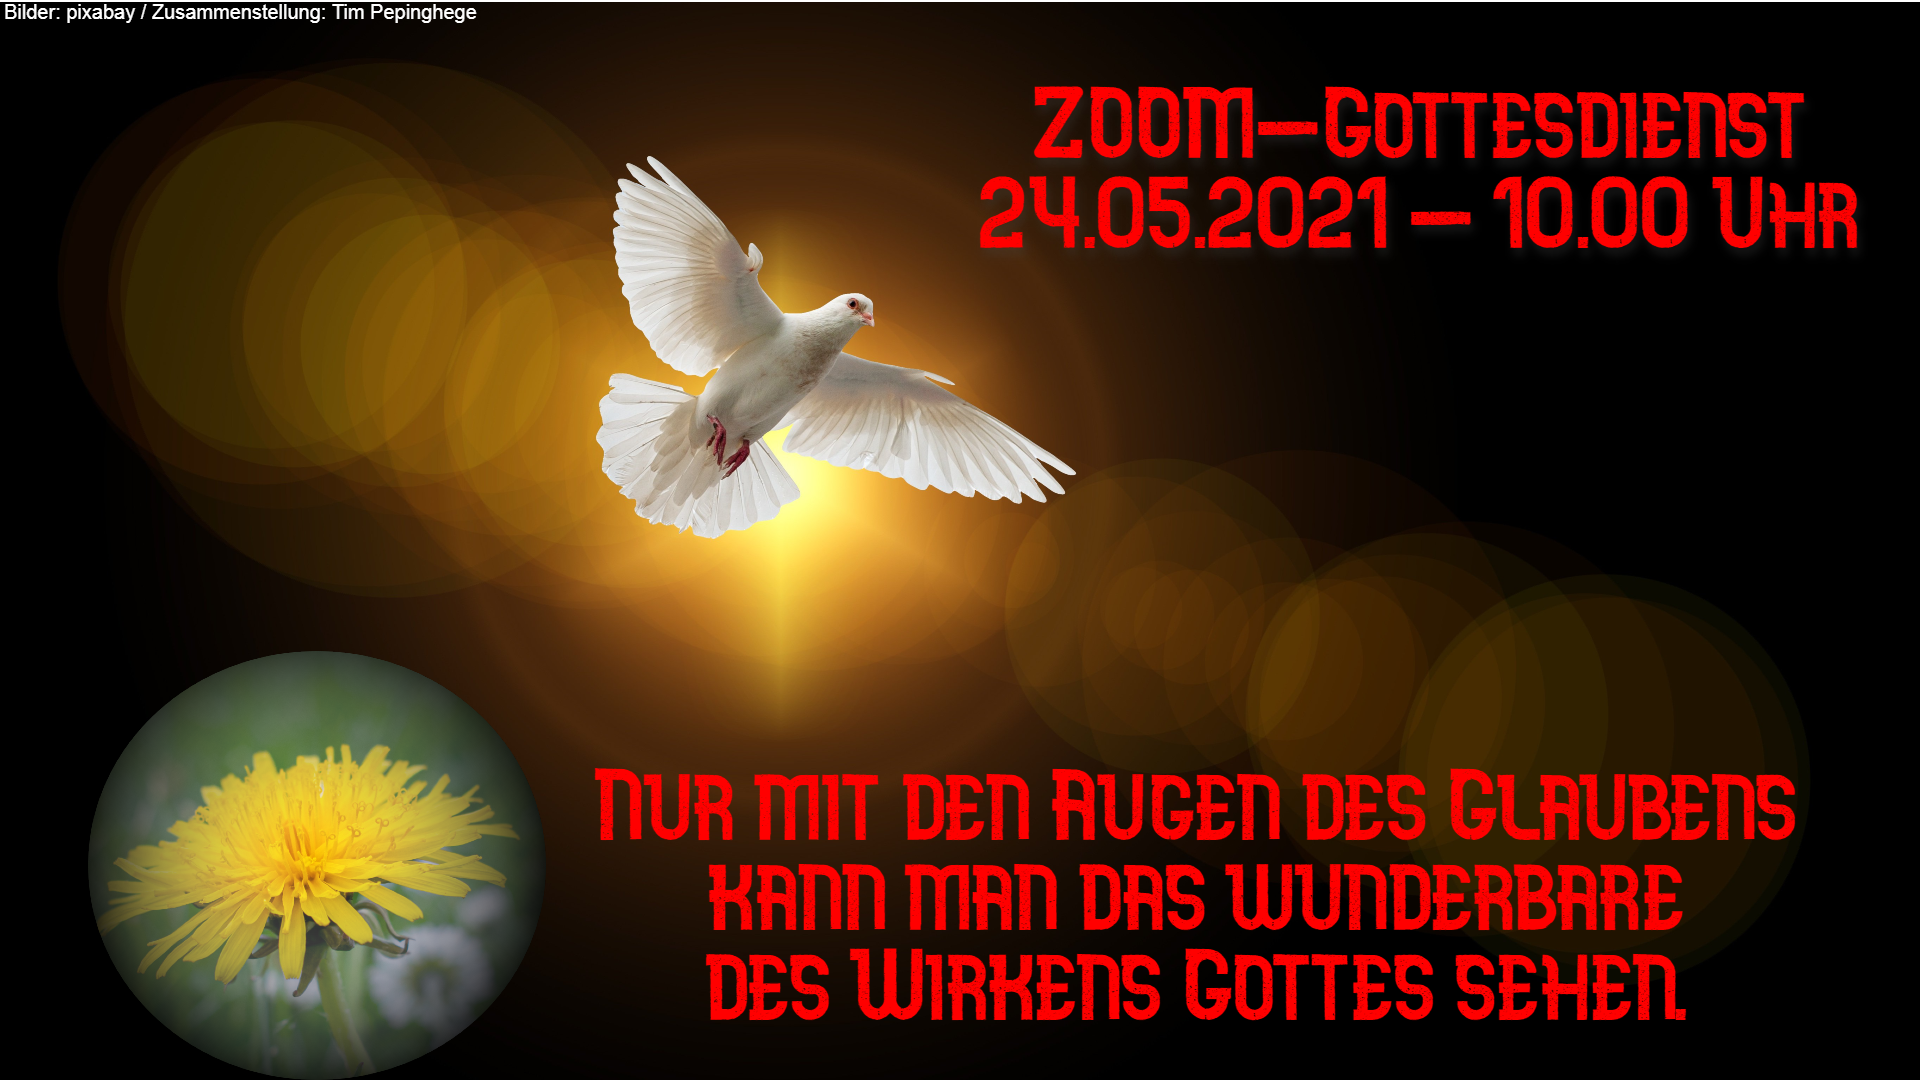 Zoom-Gottesdienst am Pfingstmontag, 24.05.2021